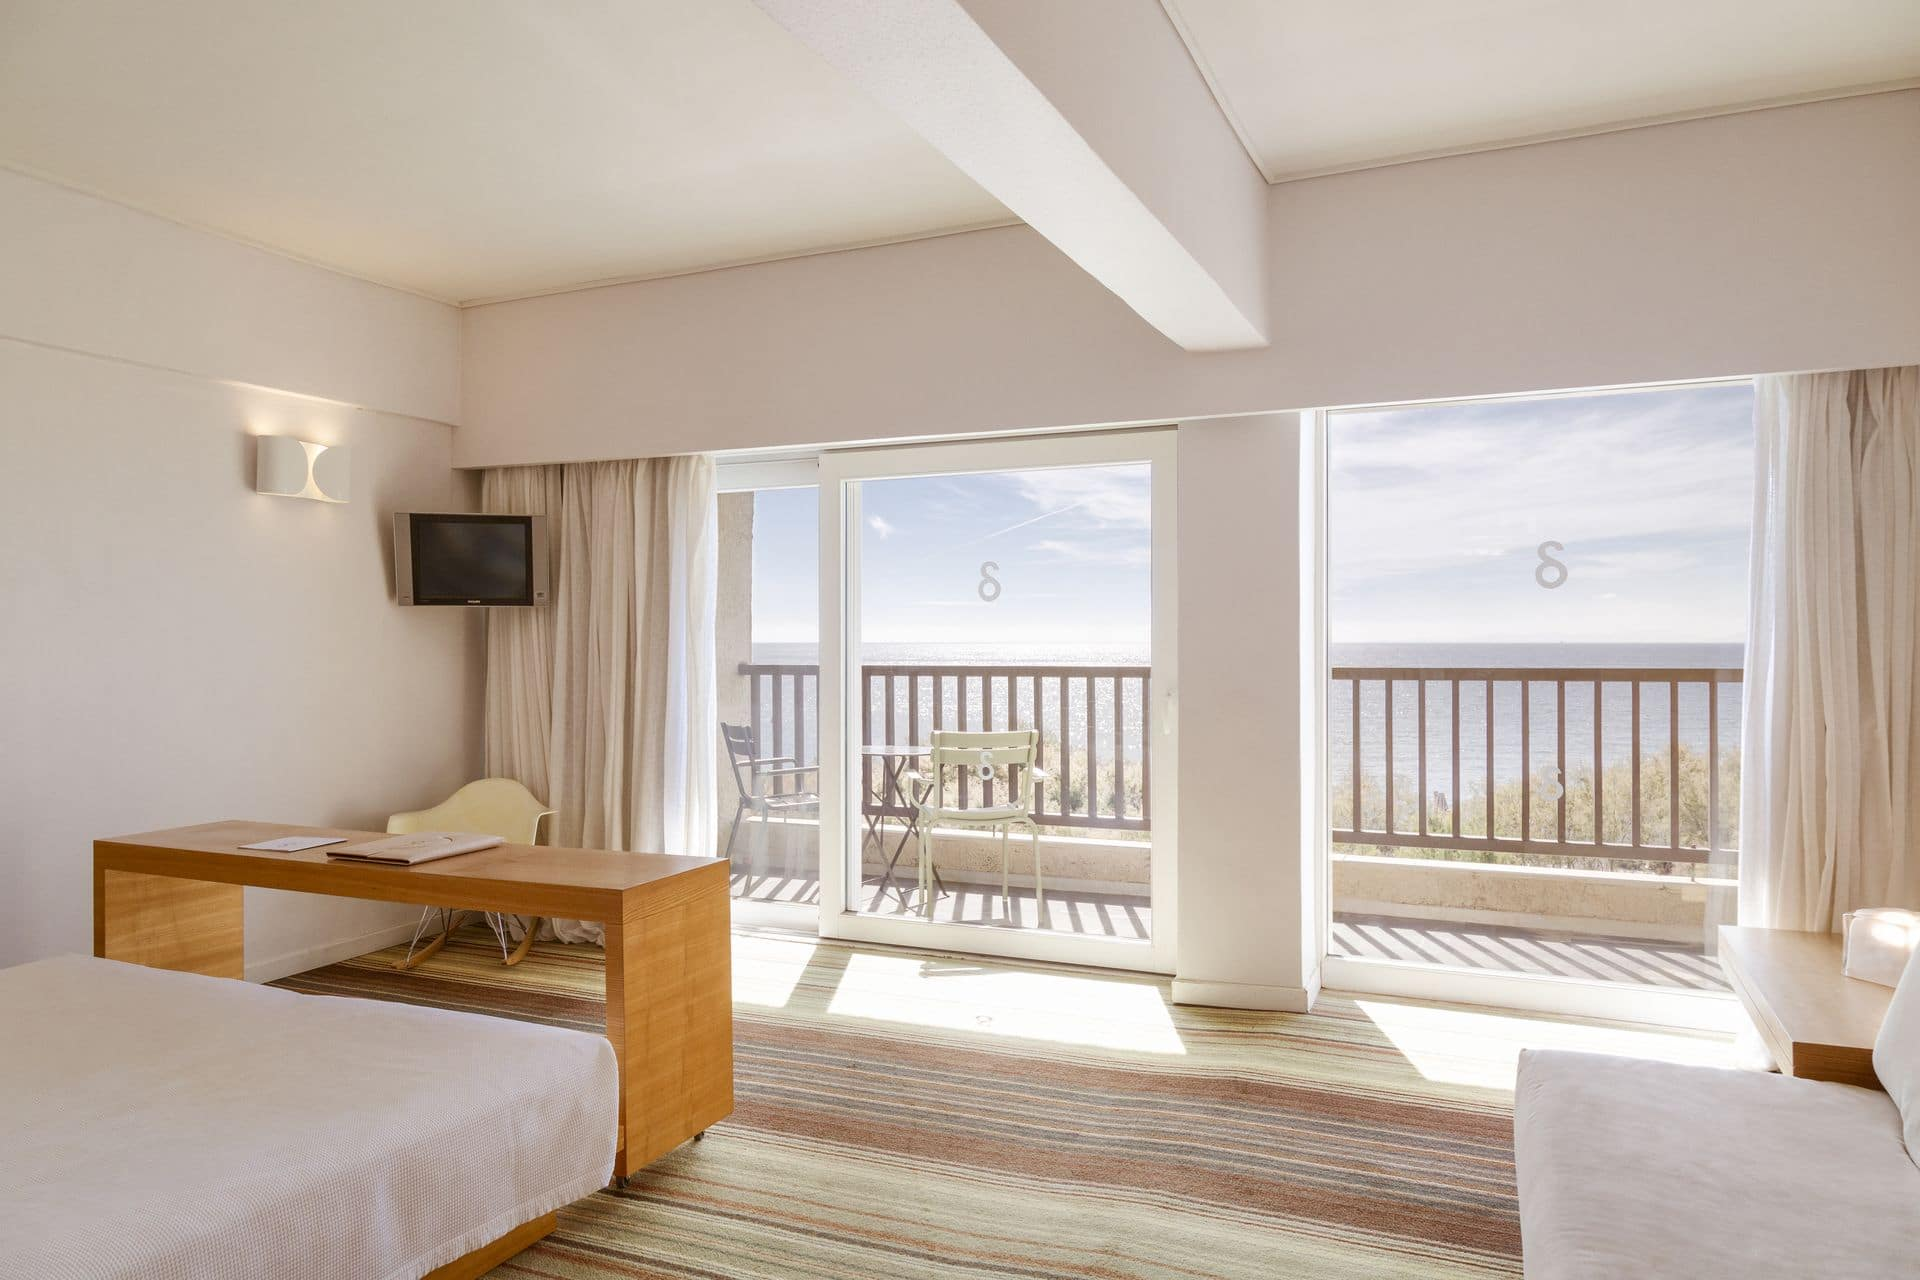 _hotel_room277_1_resized